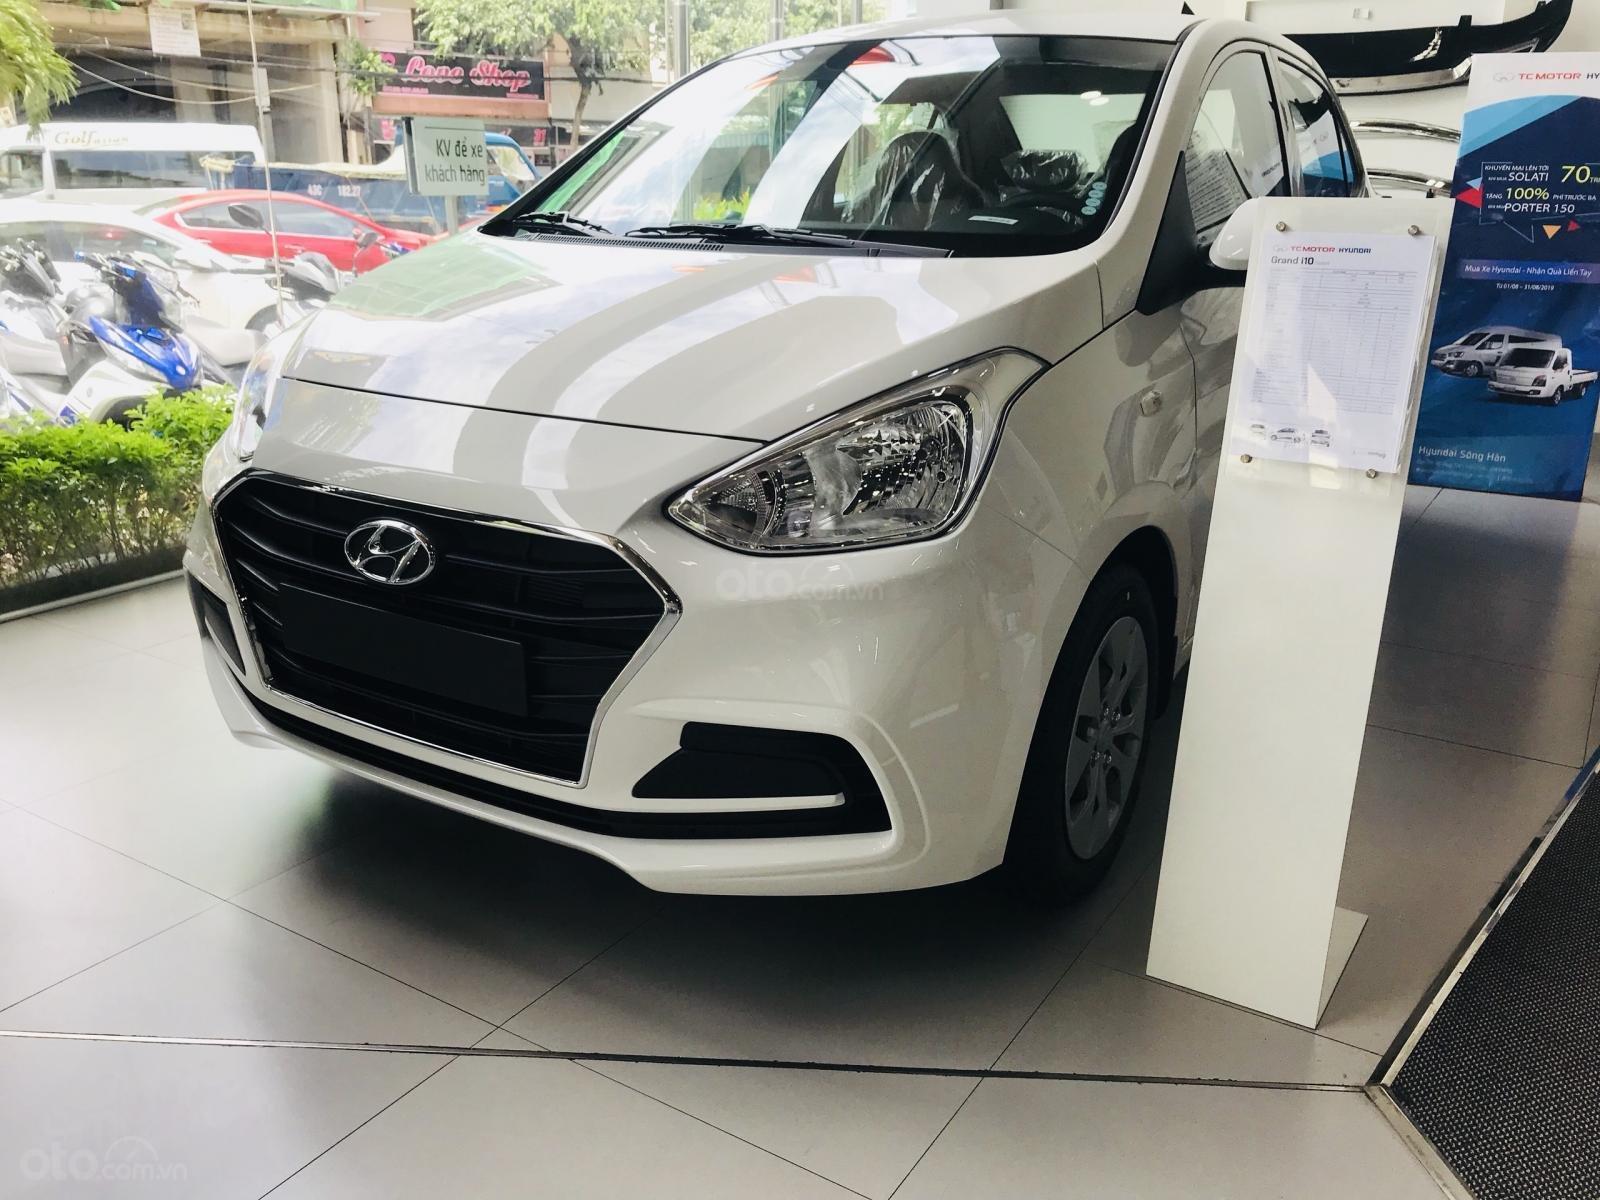 Chỉ 110 triệu sở hữu ngay Hyundai i10 2019, hotline: 0974064605 (5)